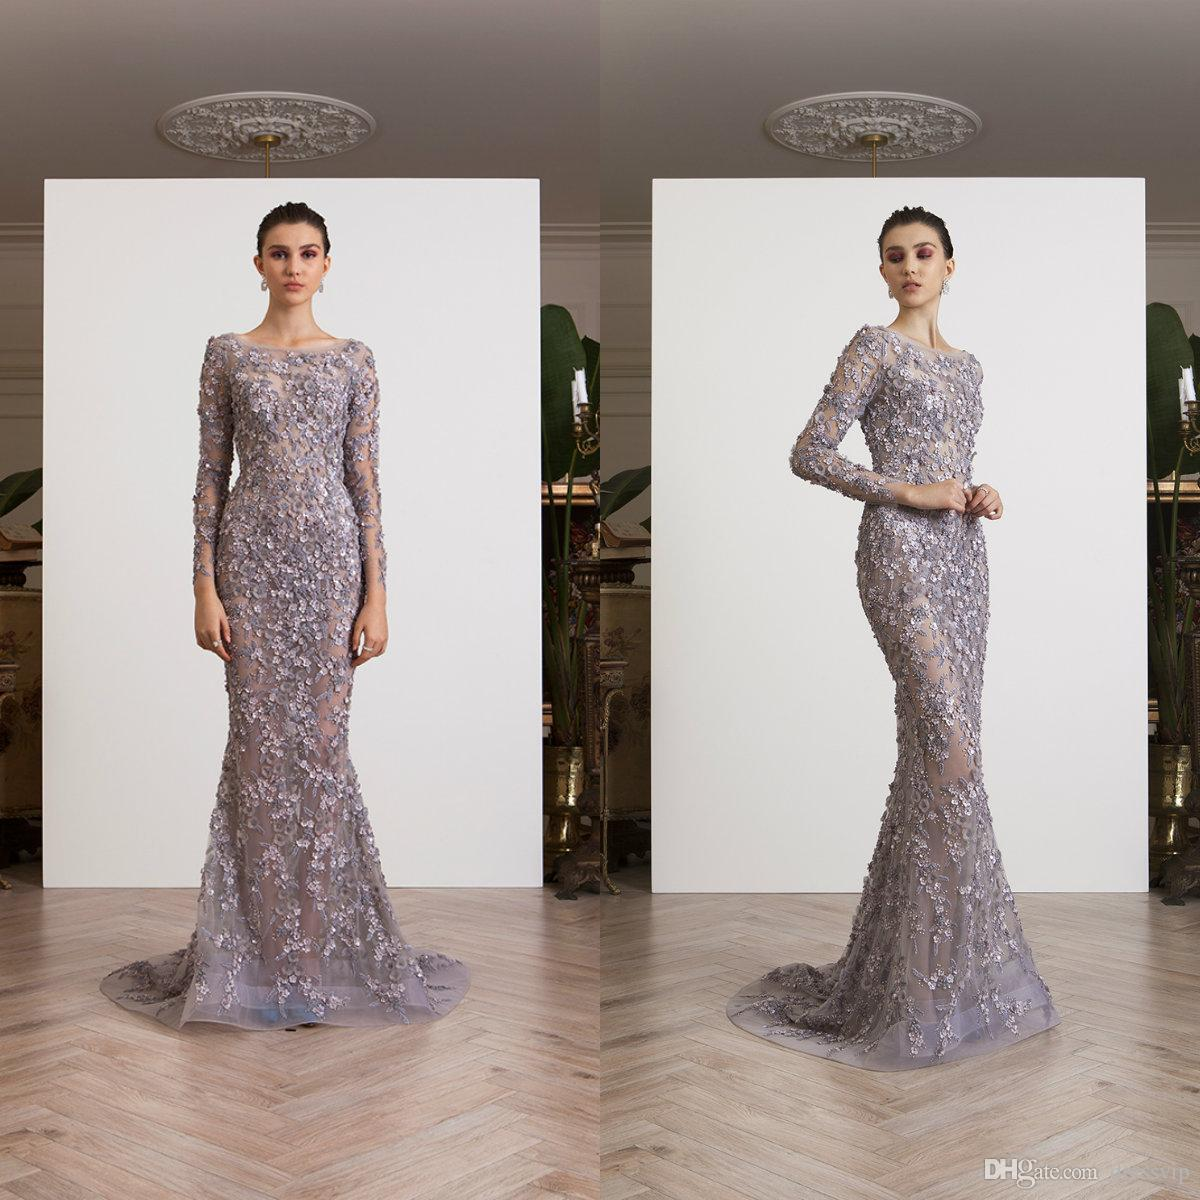 Großhandel Luxus Libanon Abendkleider 12D Floral Applikationen Perlen  Langarm Juwel Hals Spitze Abendkleid Party Nach Maß Meerjungfrau Verlobungs